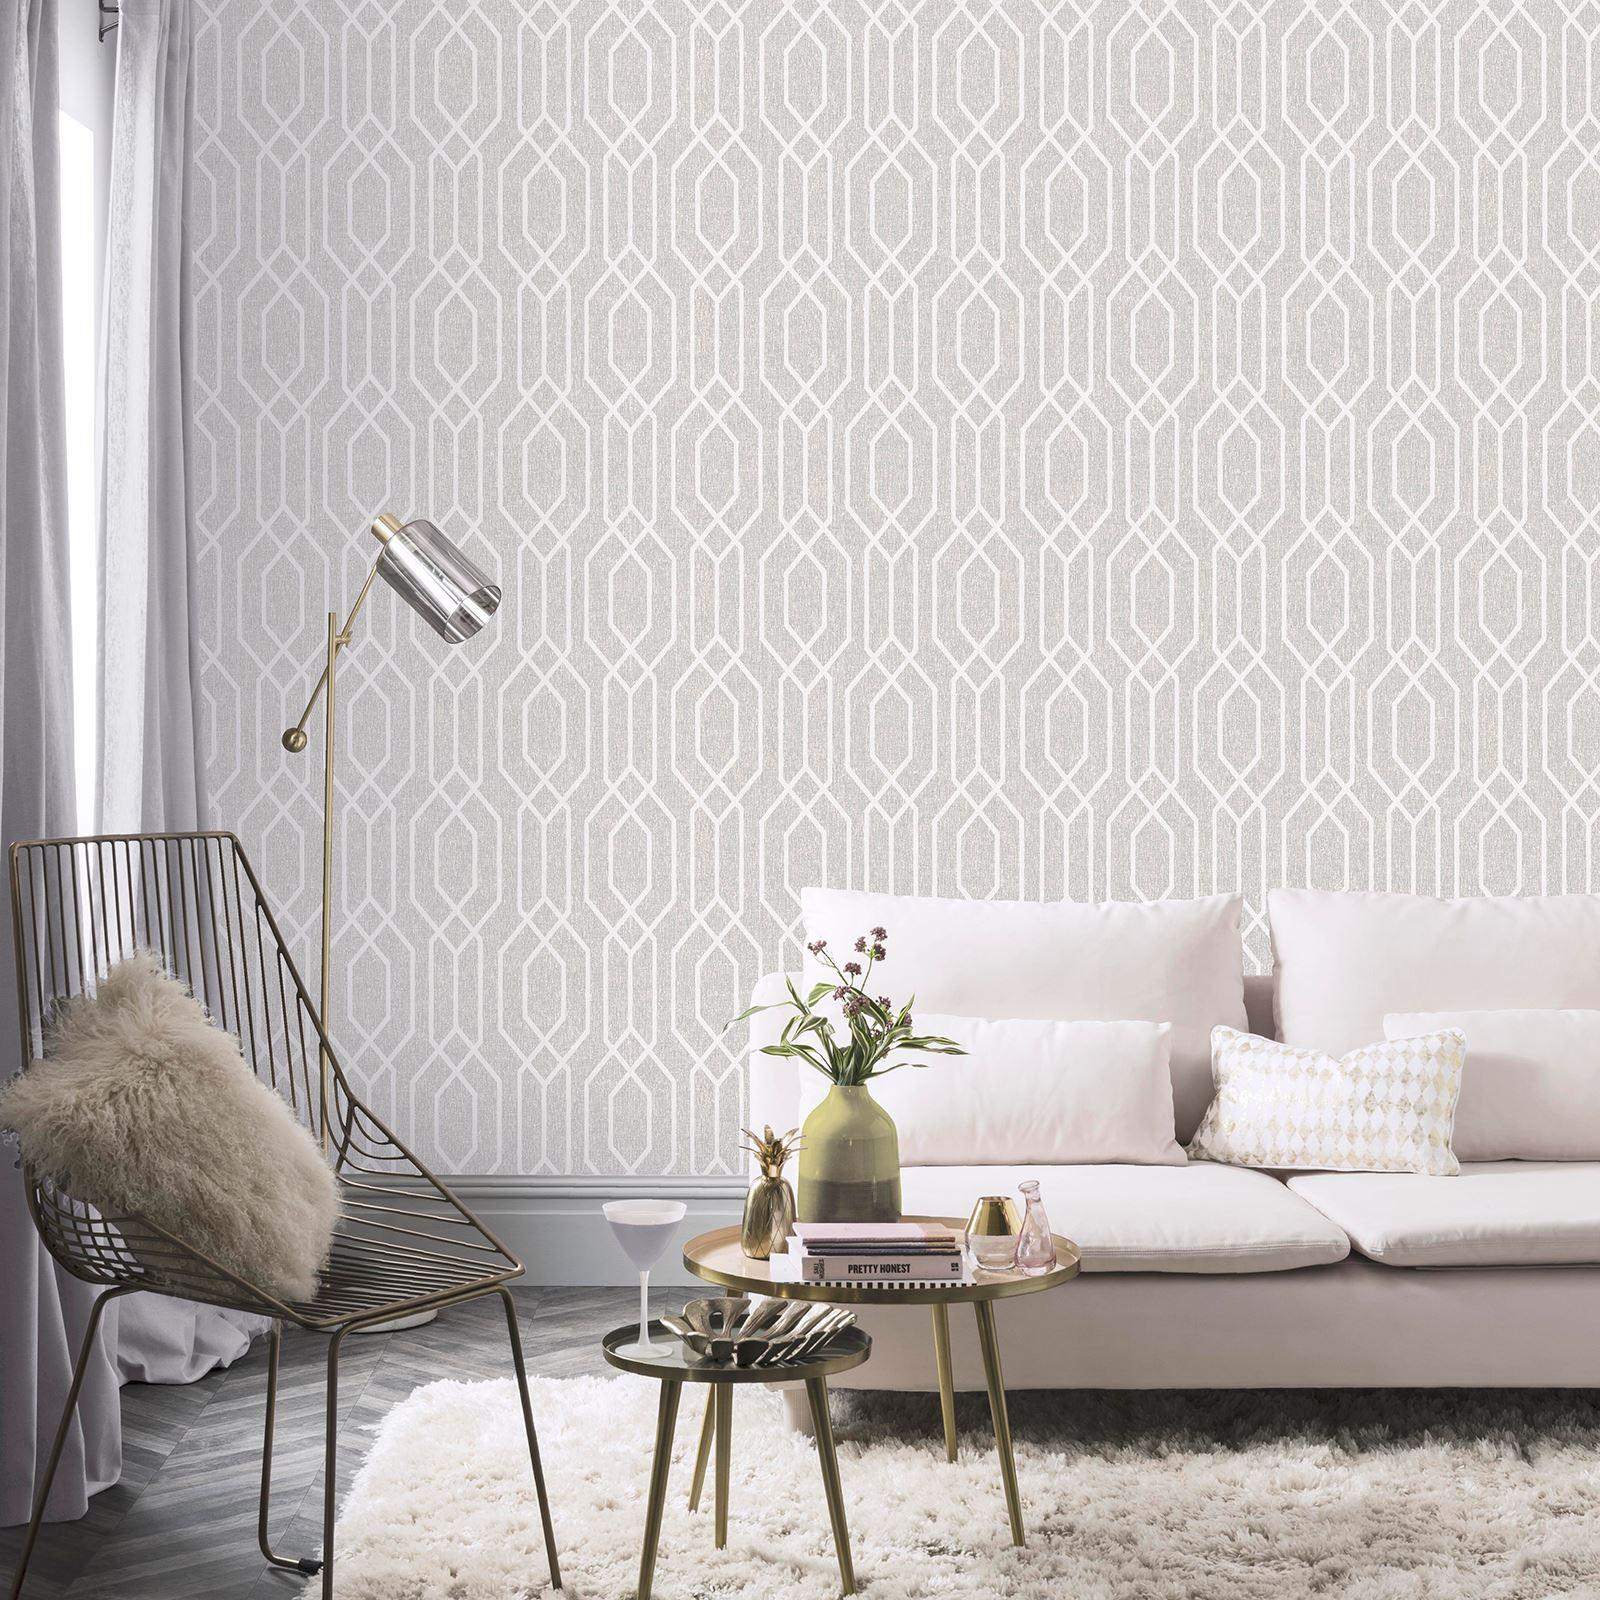 Arthouse New York Geometric Trellis Wallpaper Teal Grey